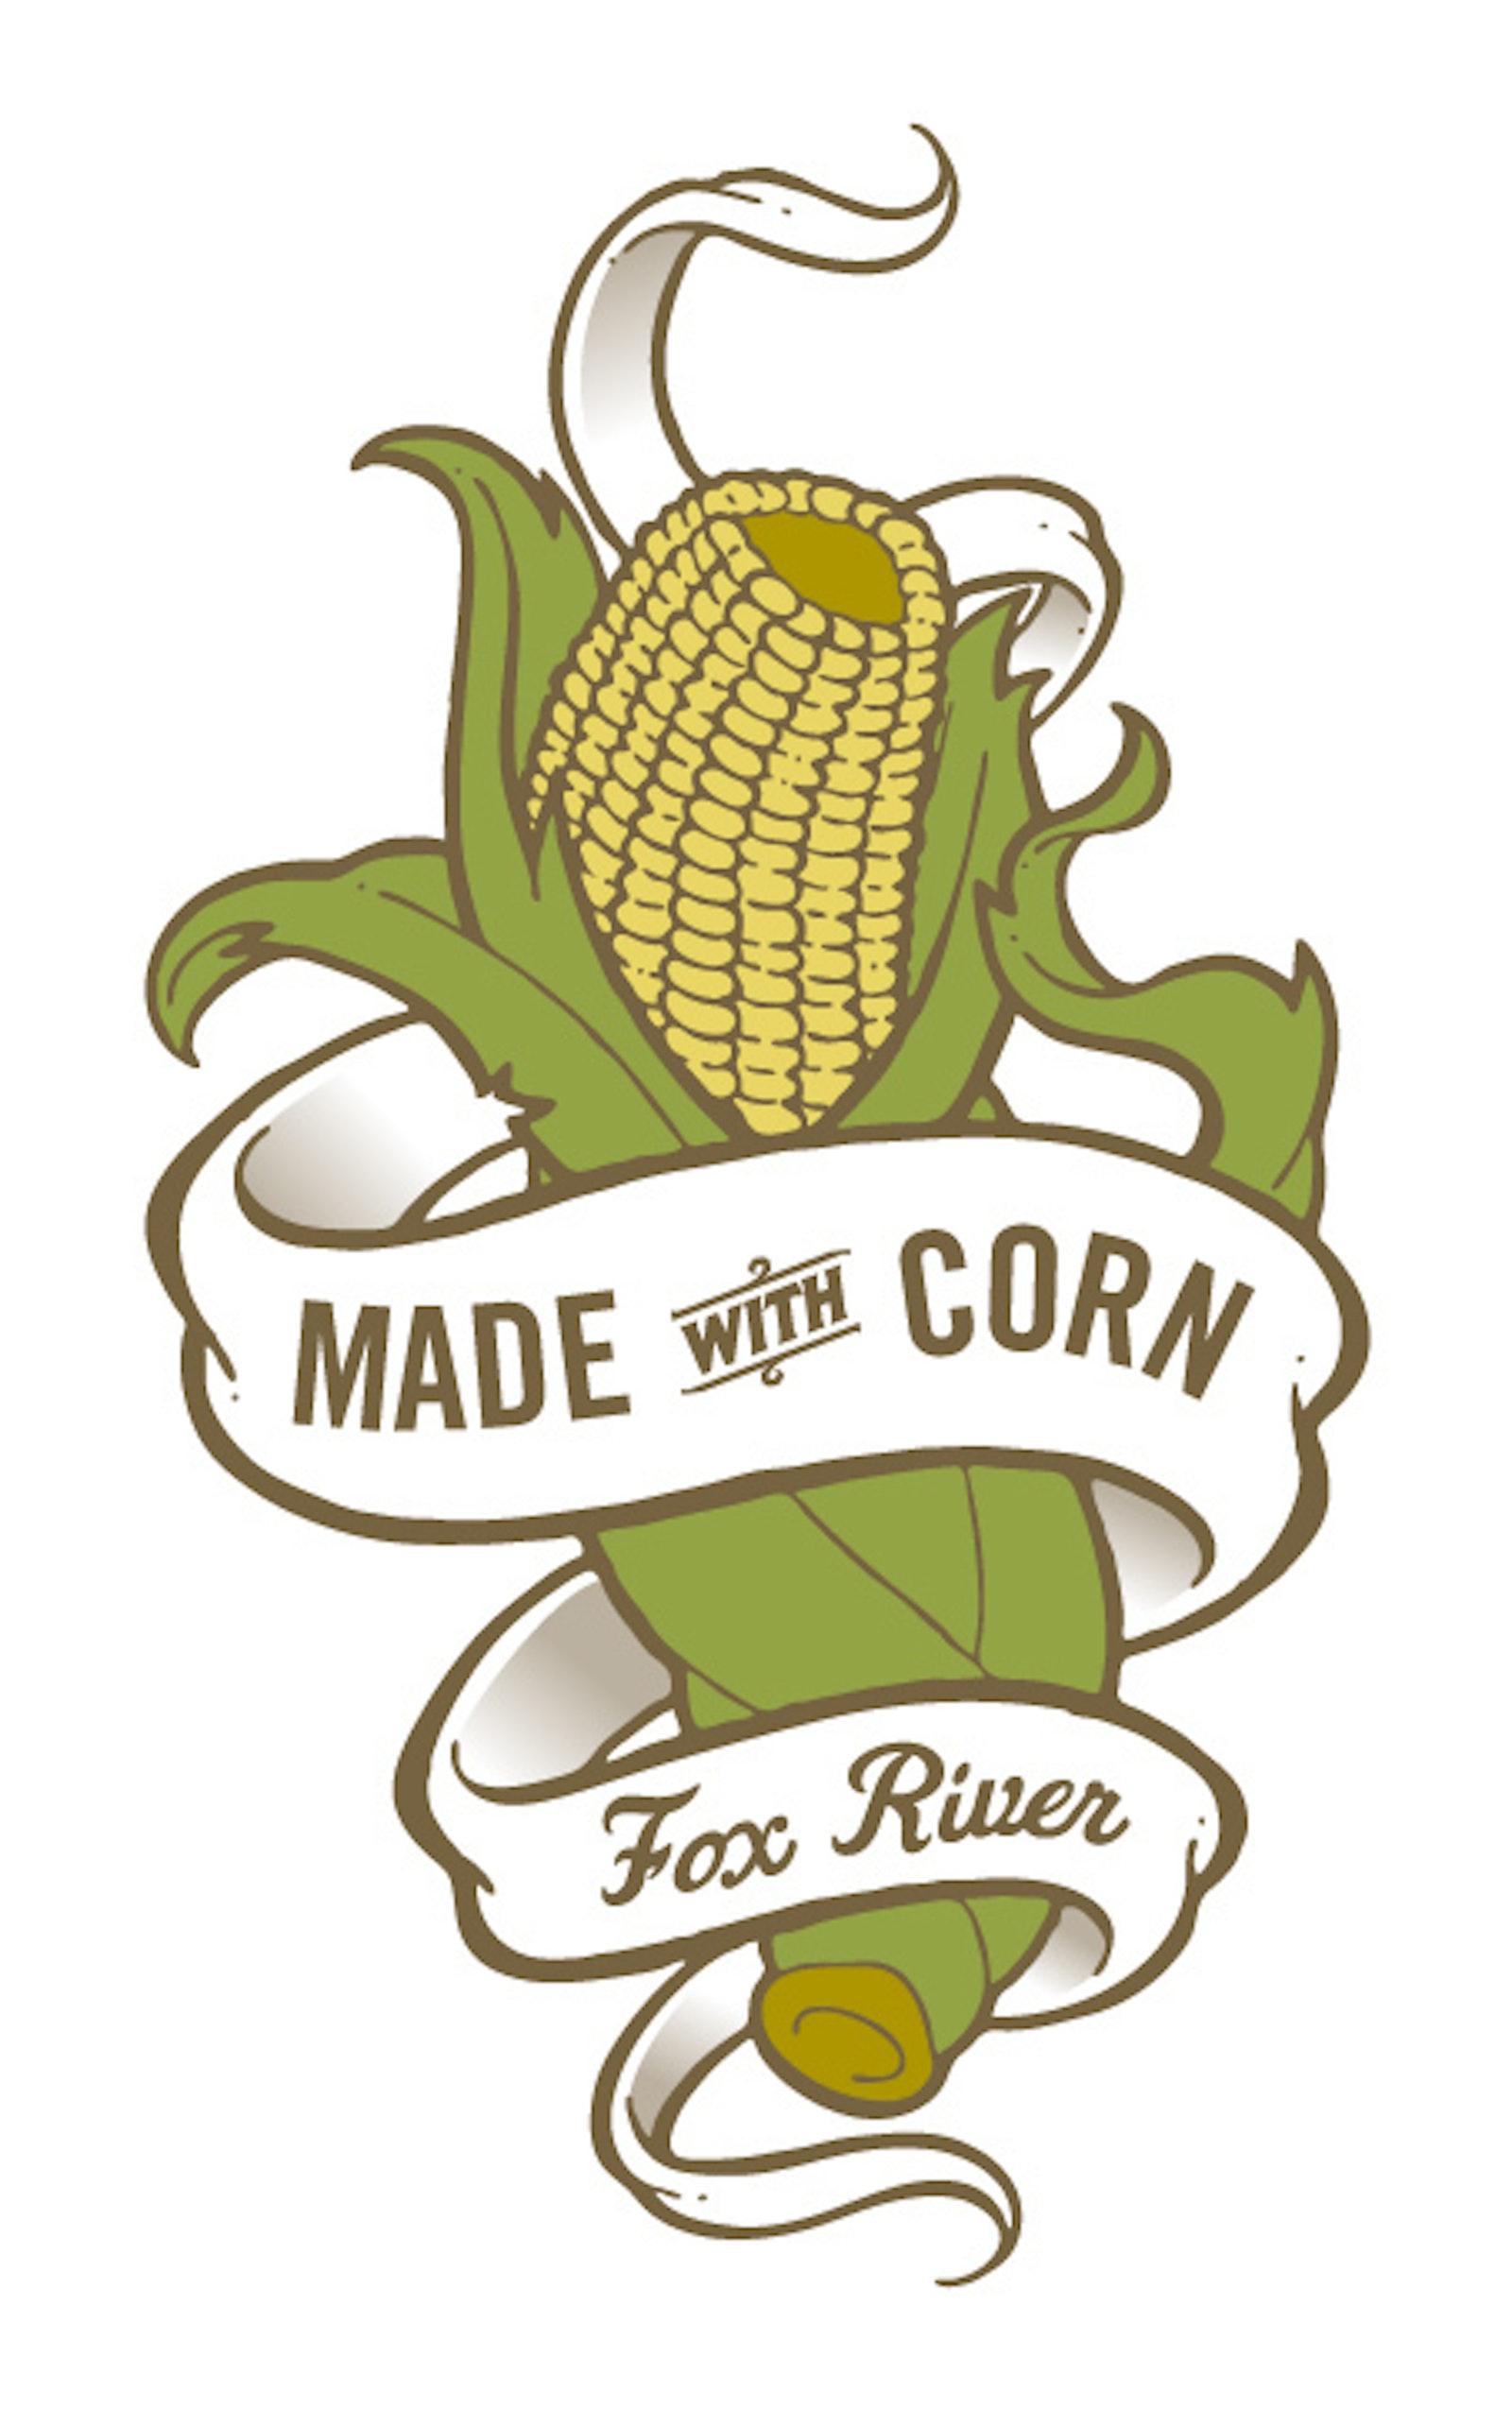 Fox River Corn logo A